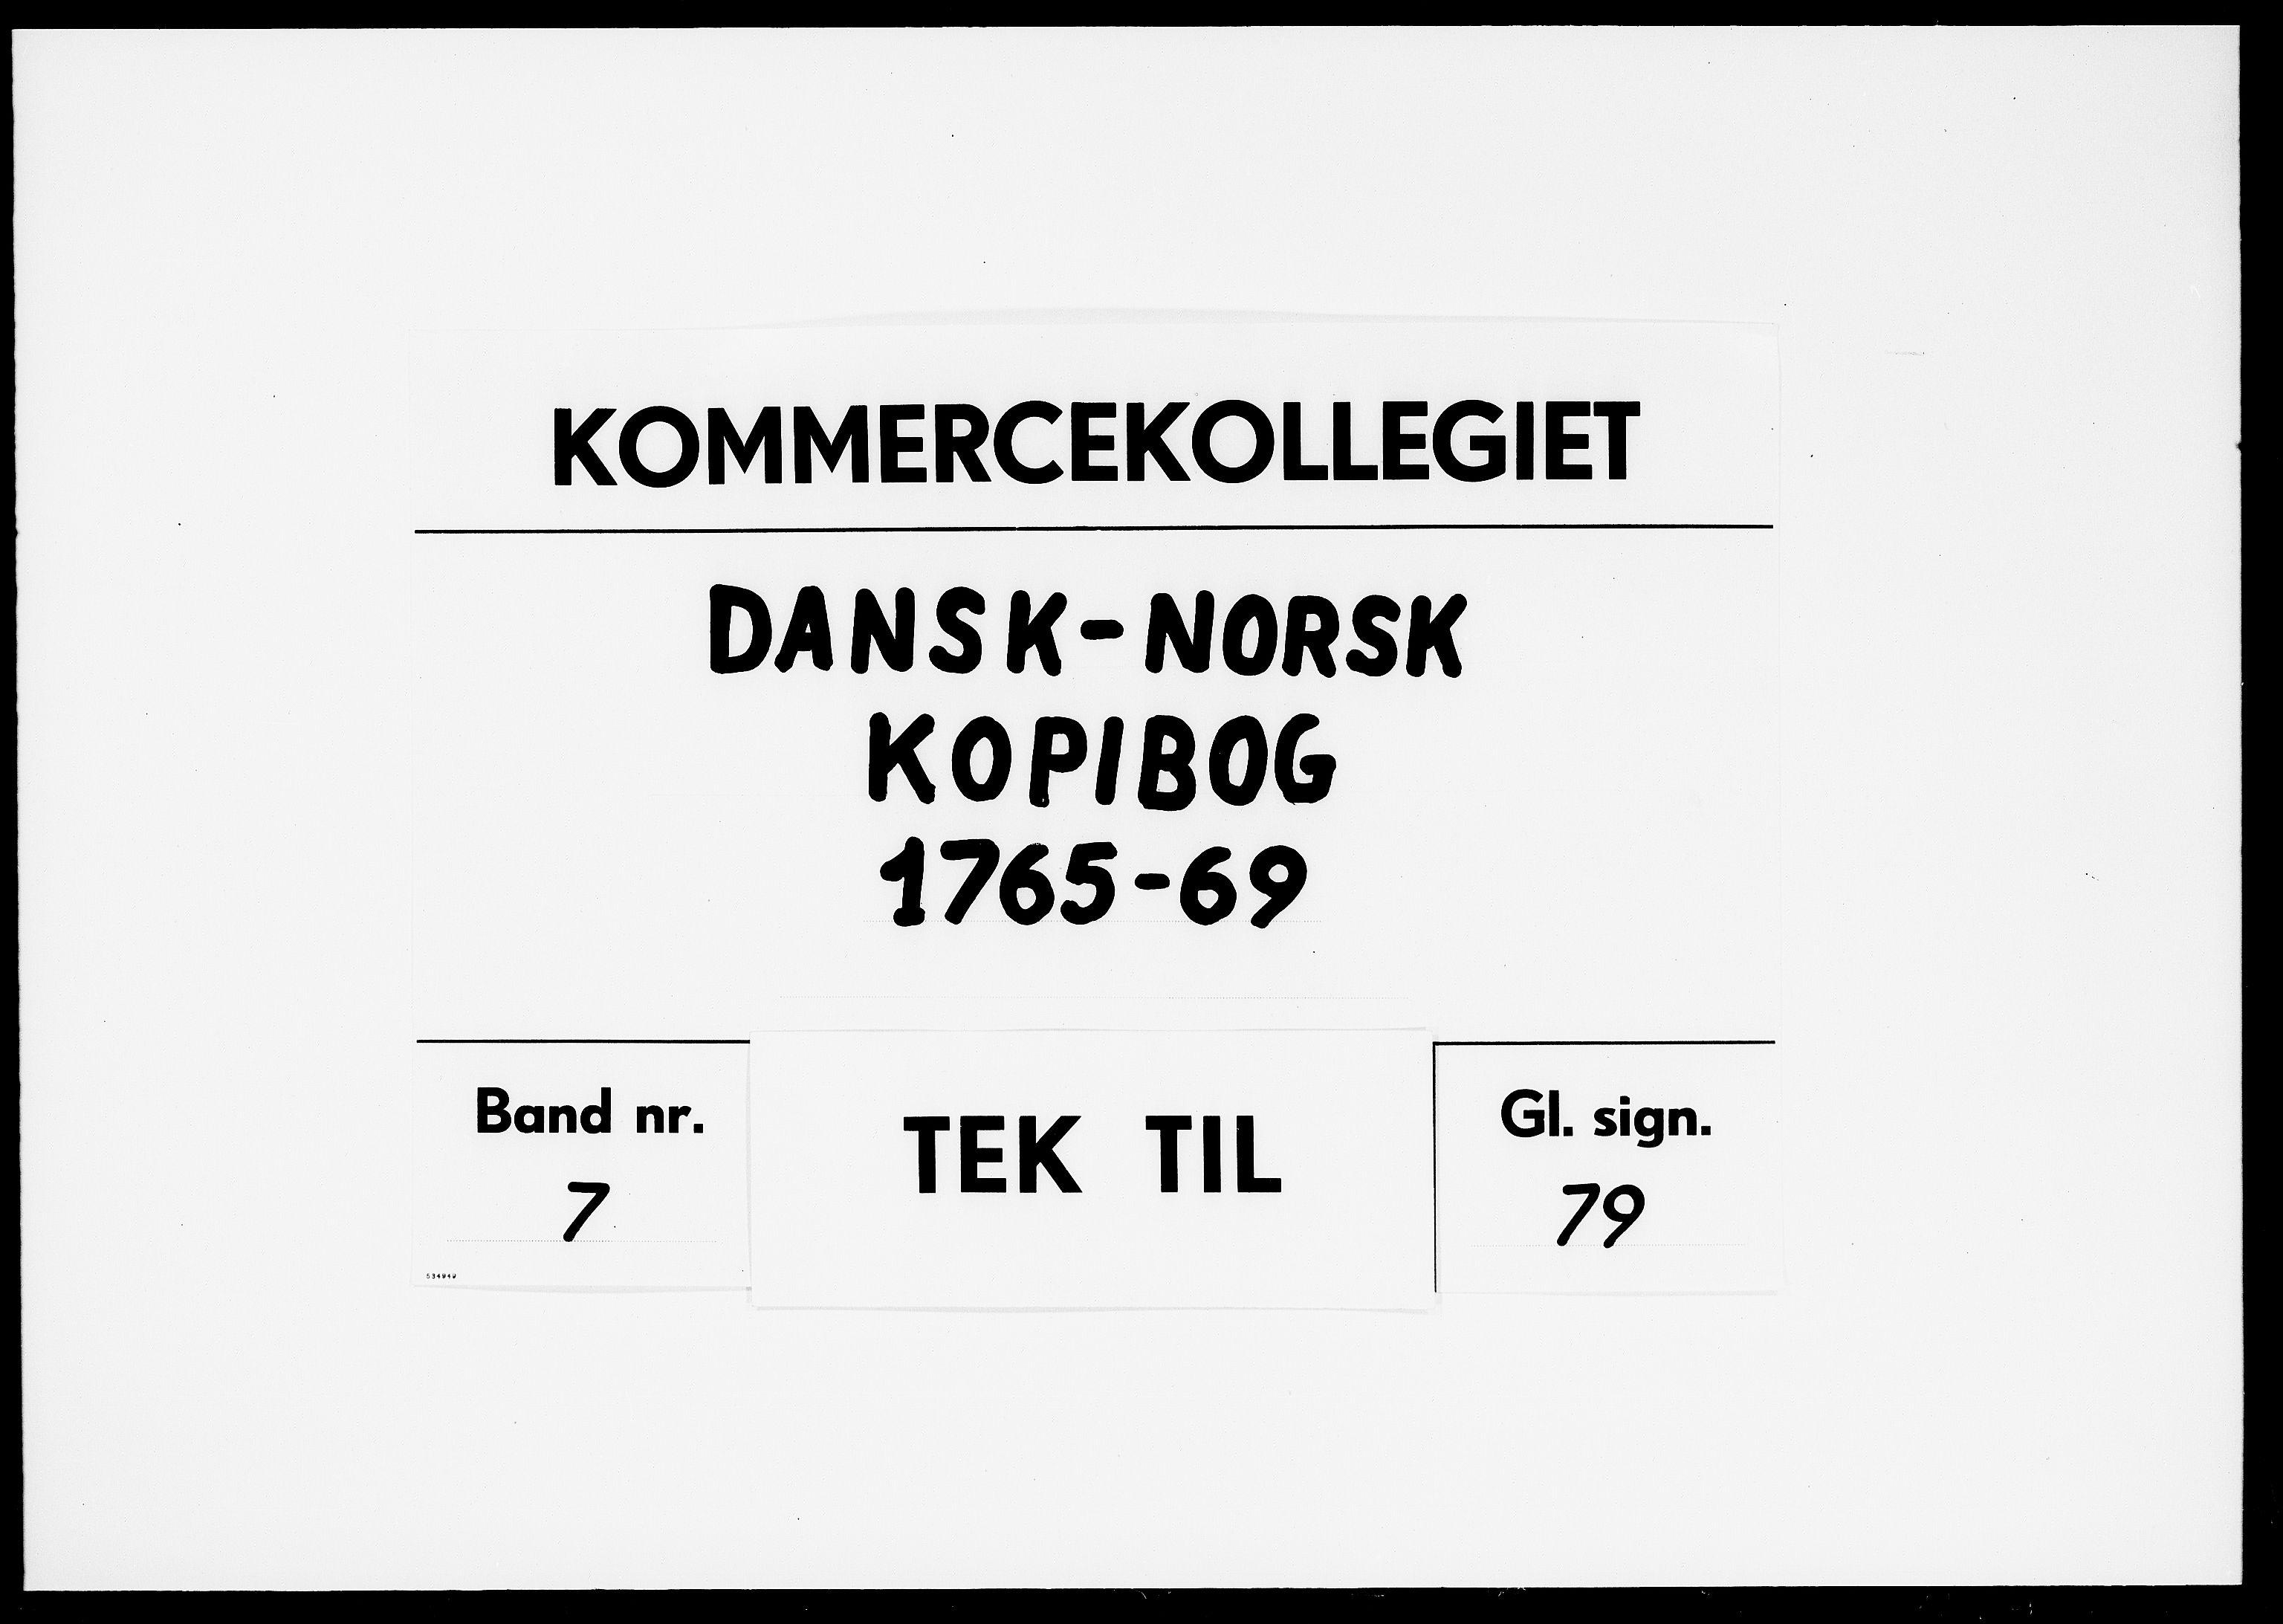 DRA, Kommercekollegiet, Dansk-Norske Sekretariat, -/47: Dansk-Norsk kopibog, 1765-1769